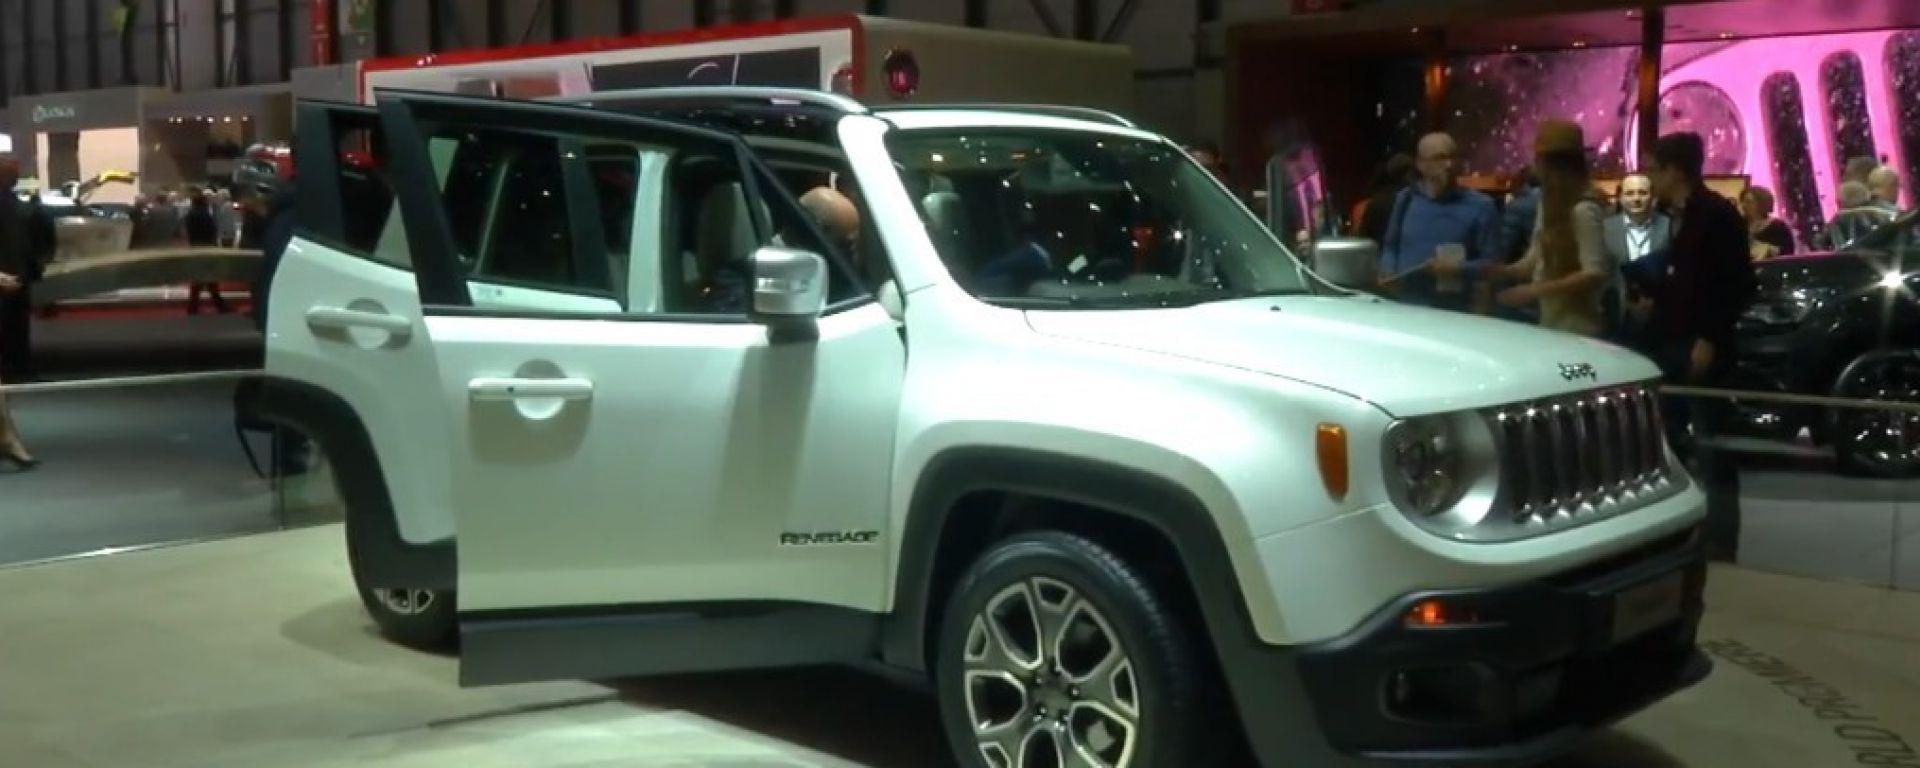 Salone di Ginevra 2014, lo stand Jeep